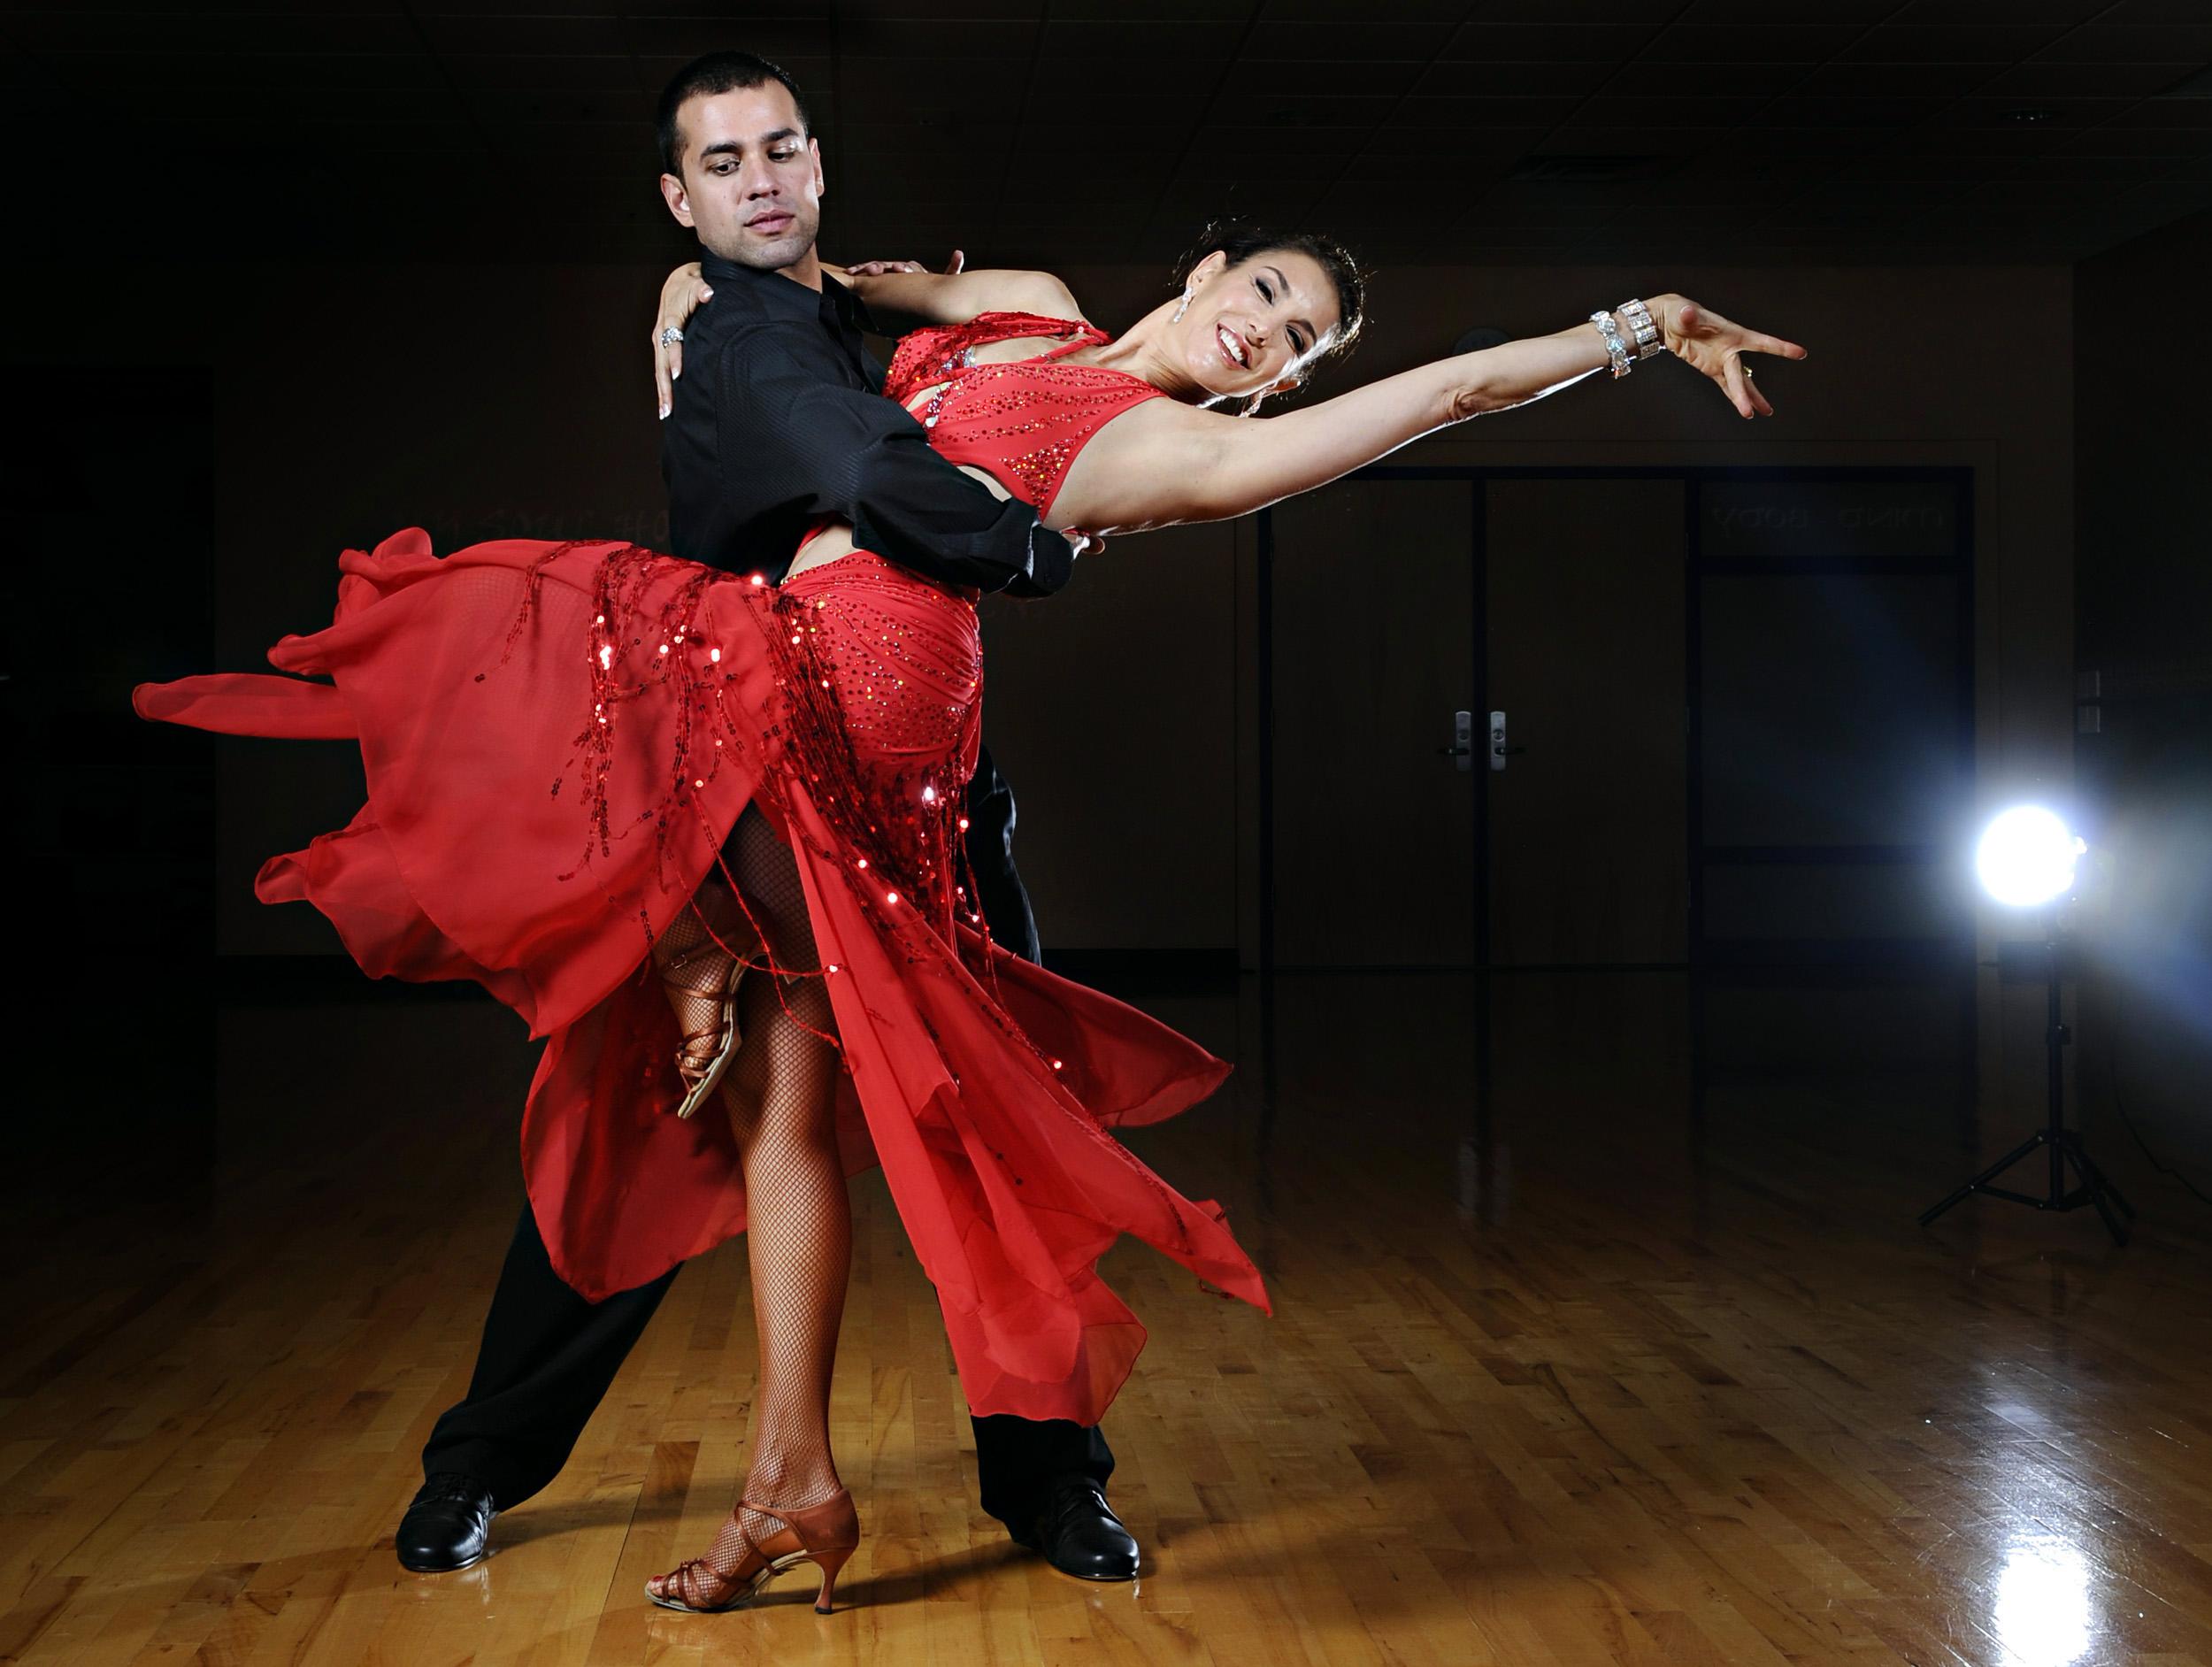 Amazing Ballroom Dancing Pictures & Backgrounds